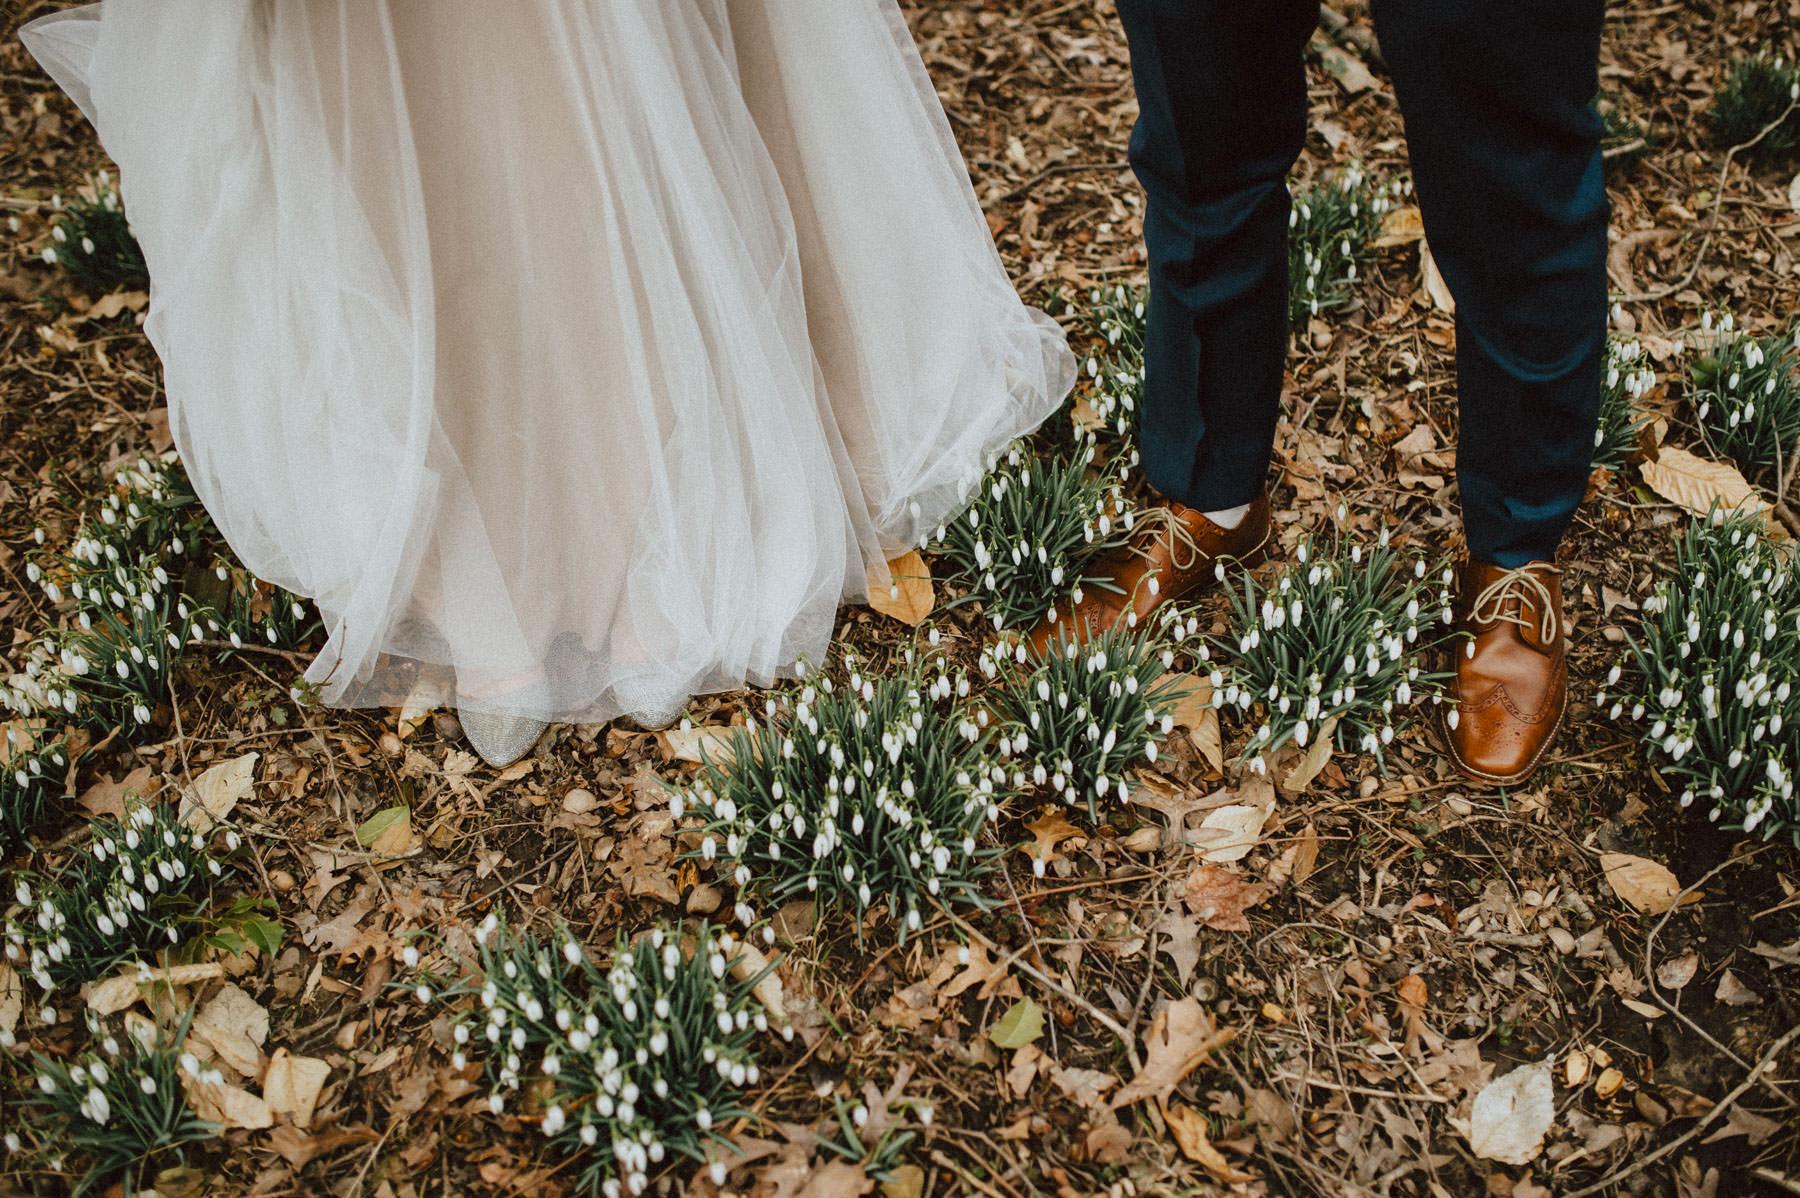 275-rockwood-carraige-house-wedding-5.jpg